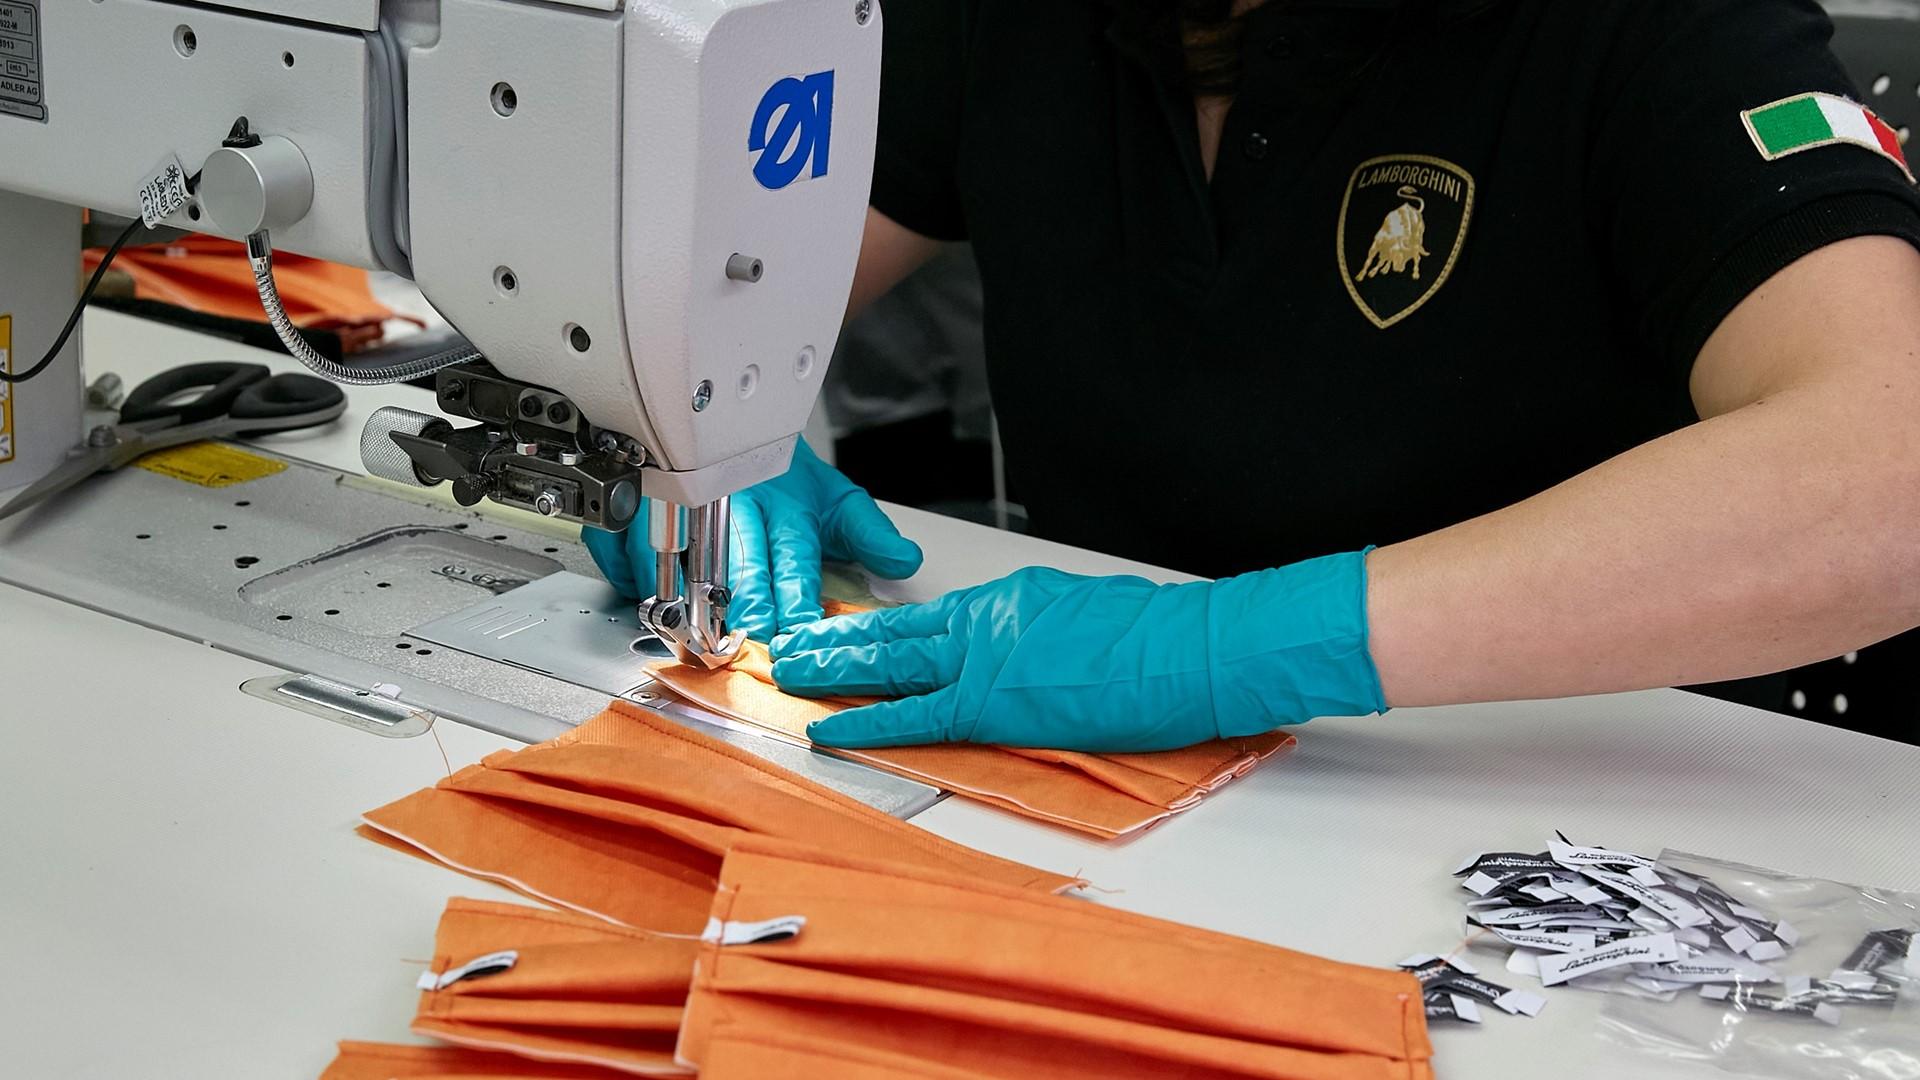 Automobili Lamborghini starts production of surgical masks and medical shields for use in Coronavirus pandemic - Image 5